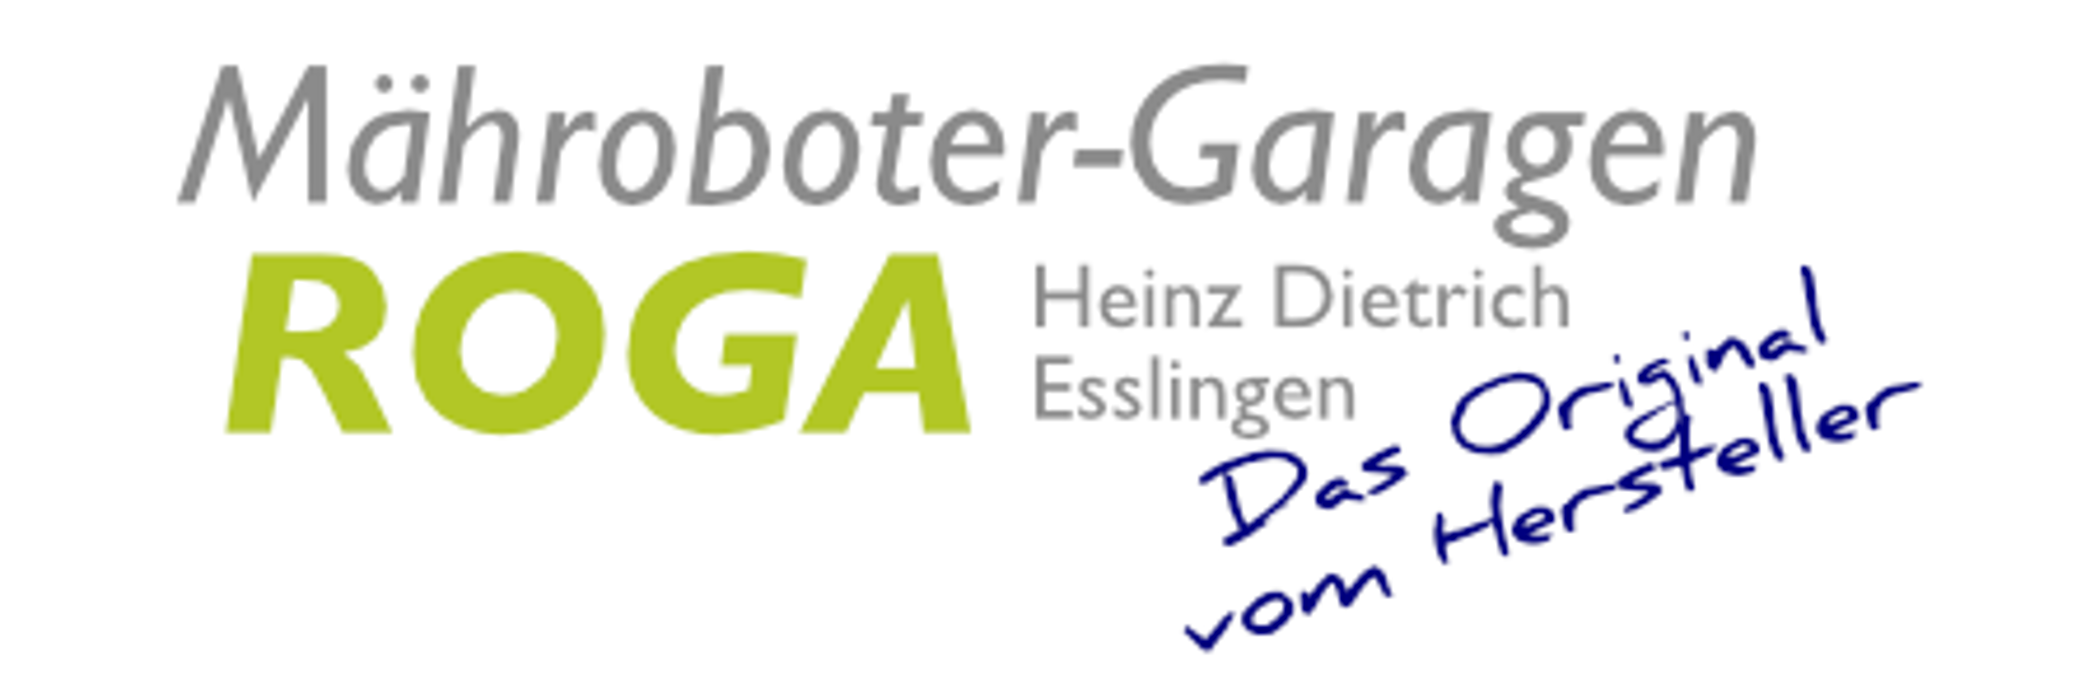 Bild zu Dietrich ROGA - Mähroboter-Garagen in Esslingen am Neckar